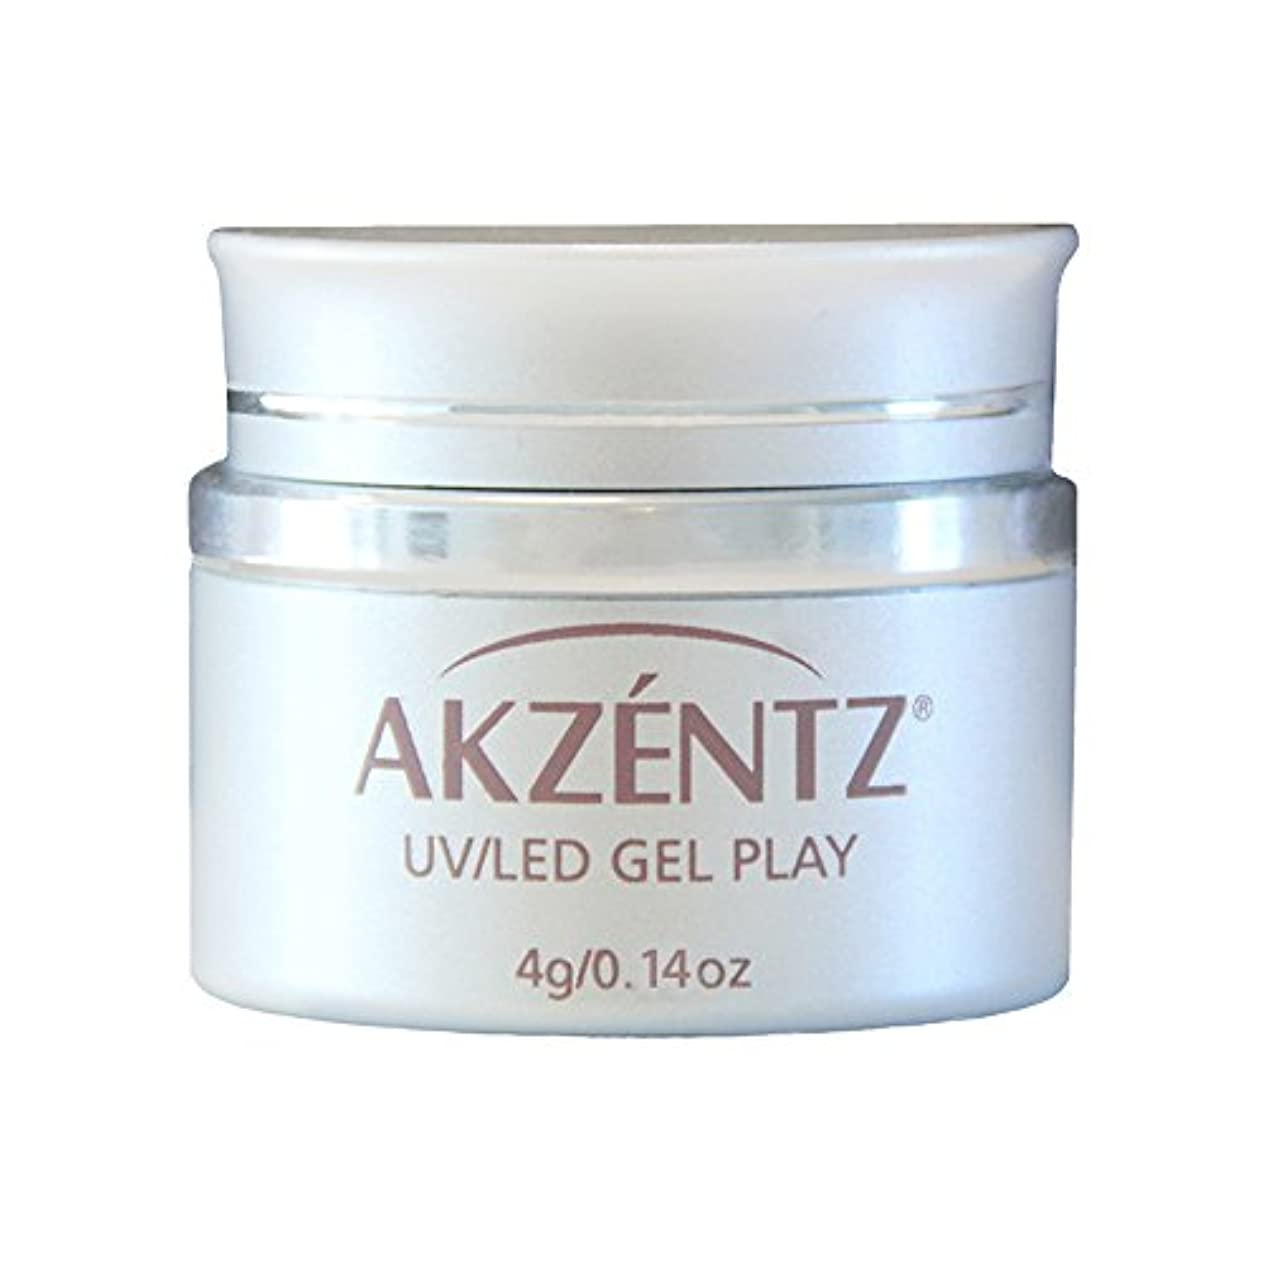 AKZENTZ カラージェル ジェルプレイ グリッター シルバーサンド 4g UV/LED対応